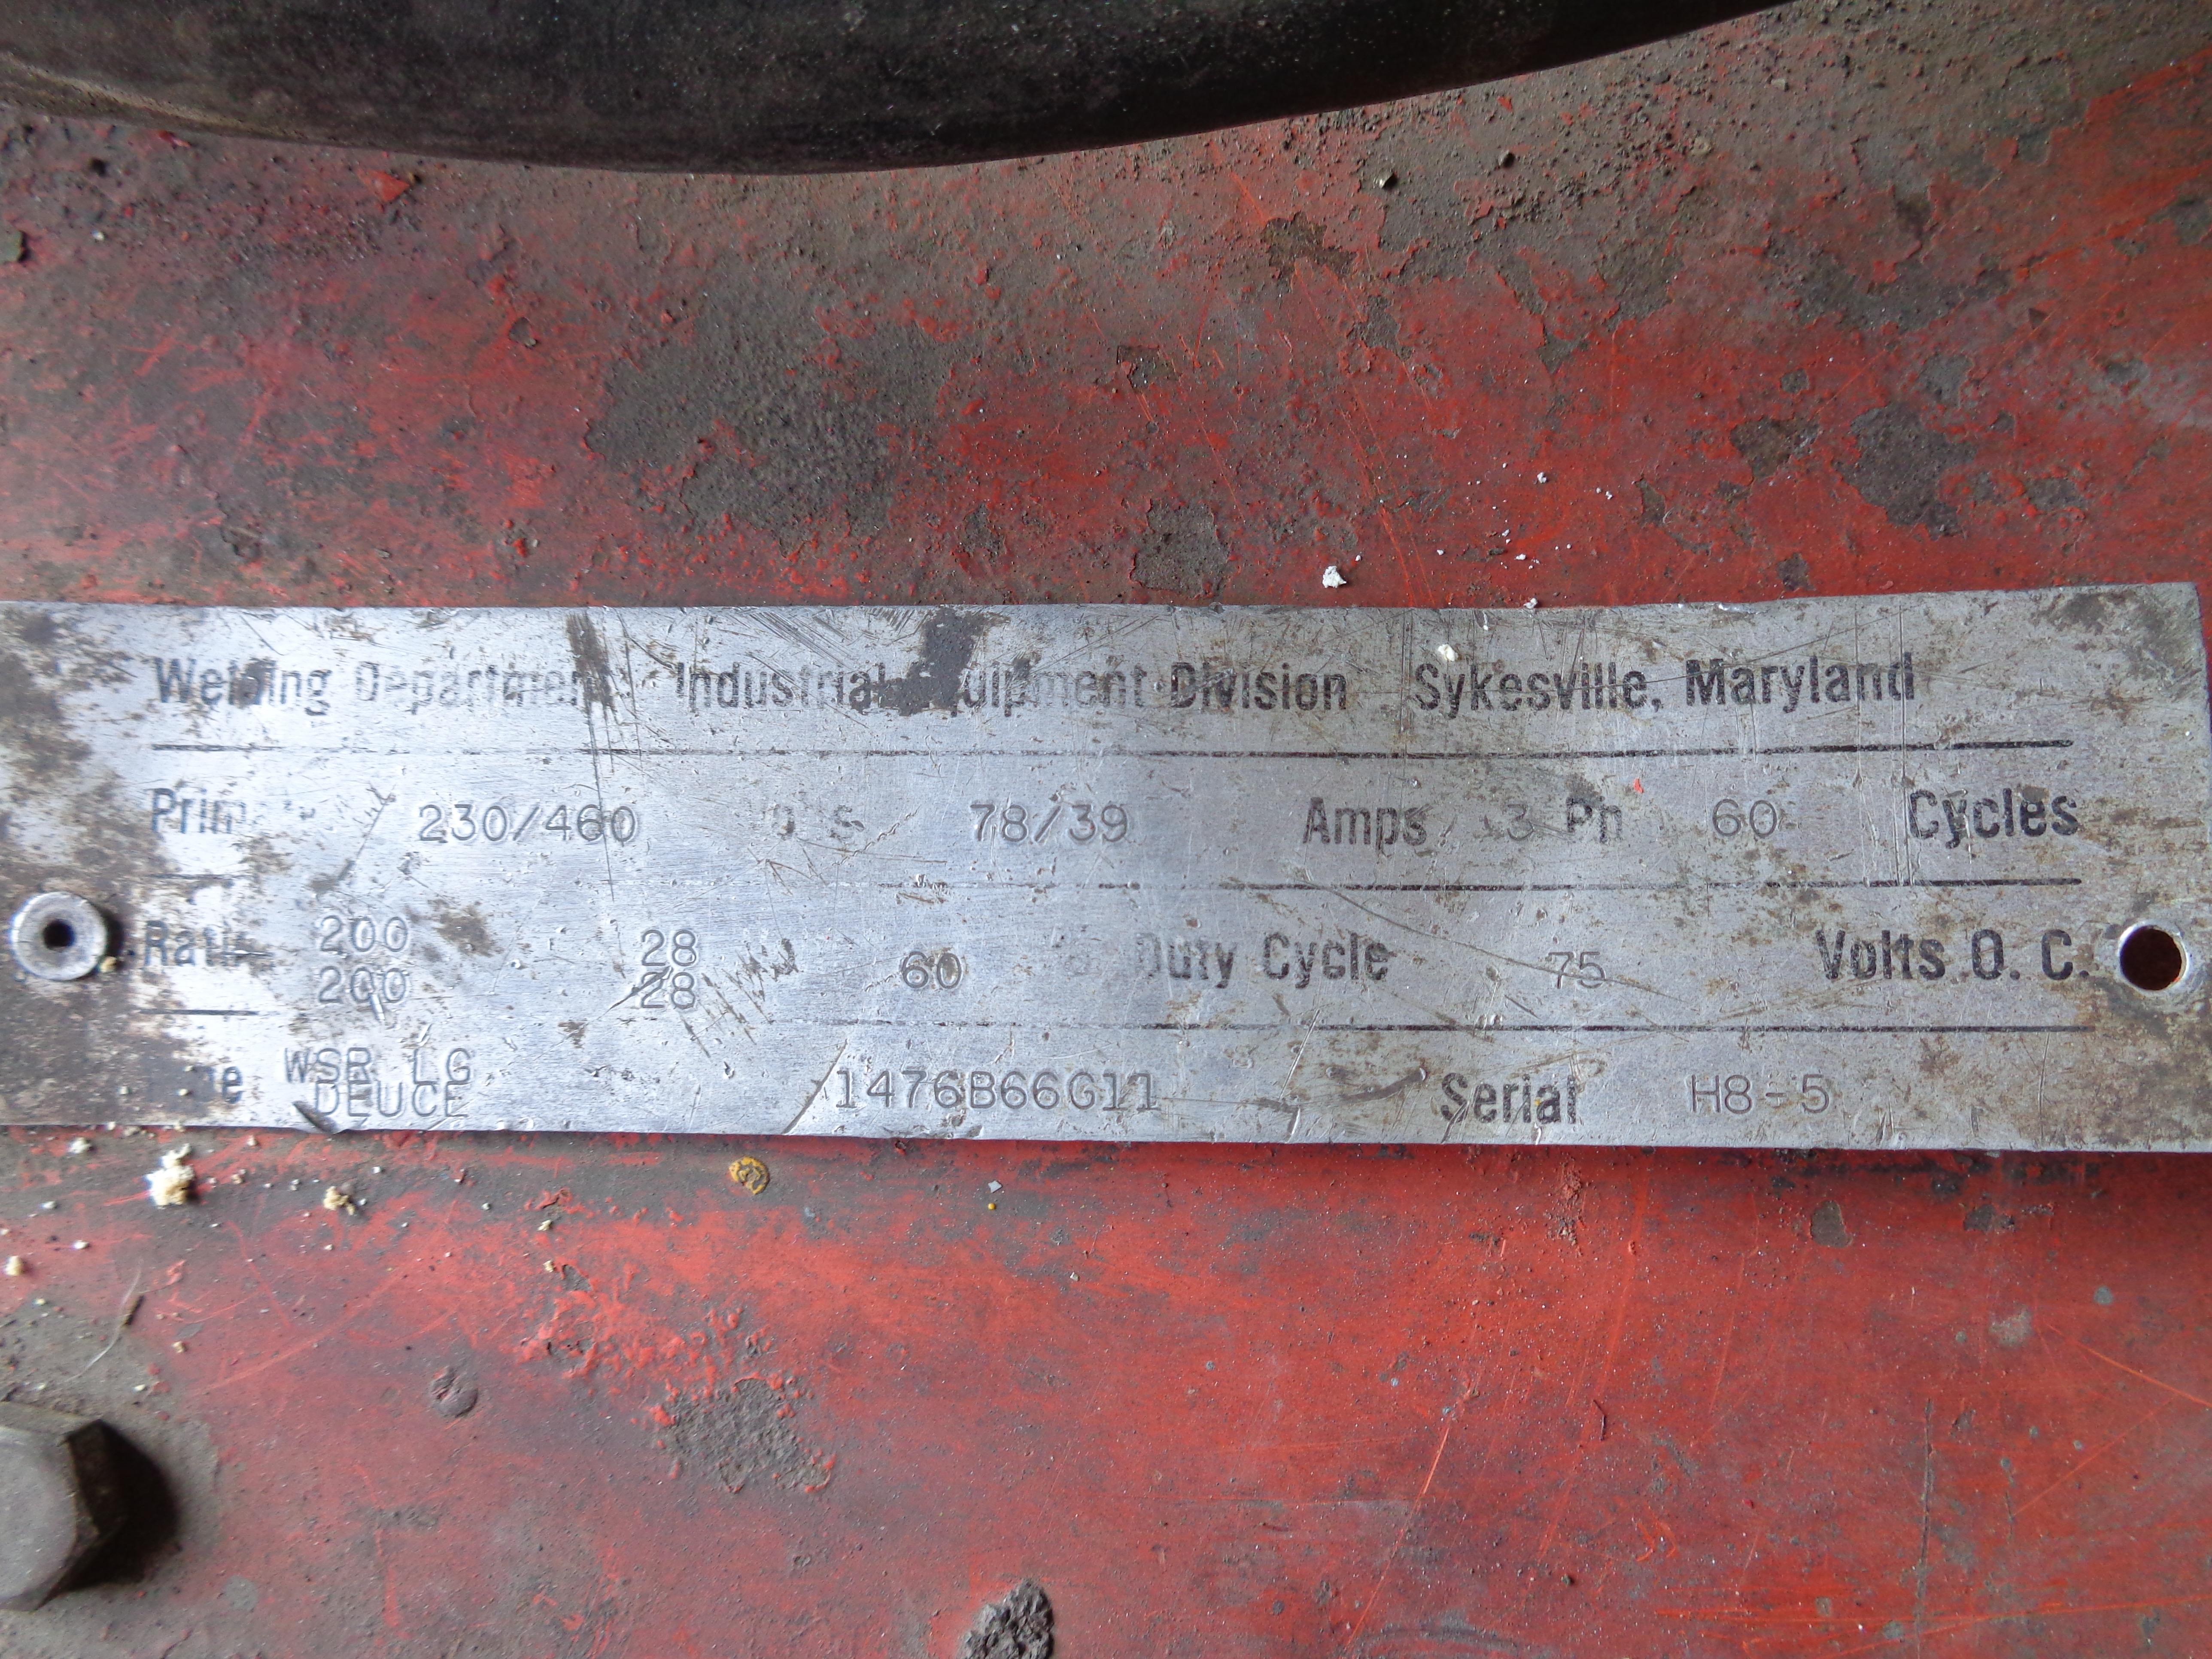 Westinghouse Welder H8-5 - Image 5 of 5